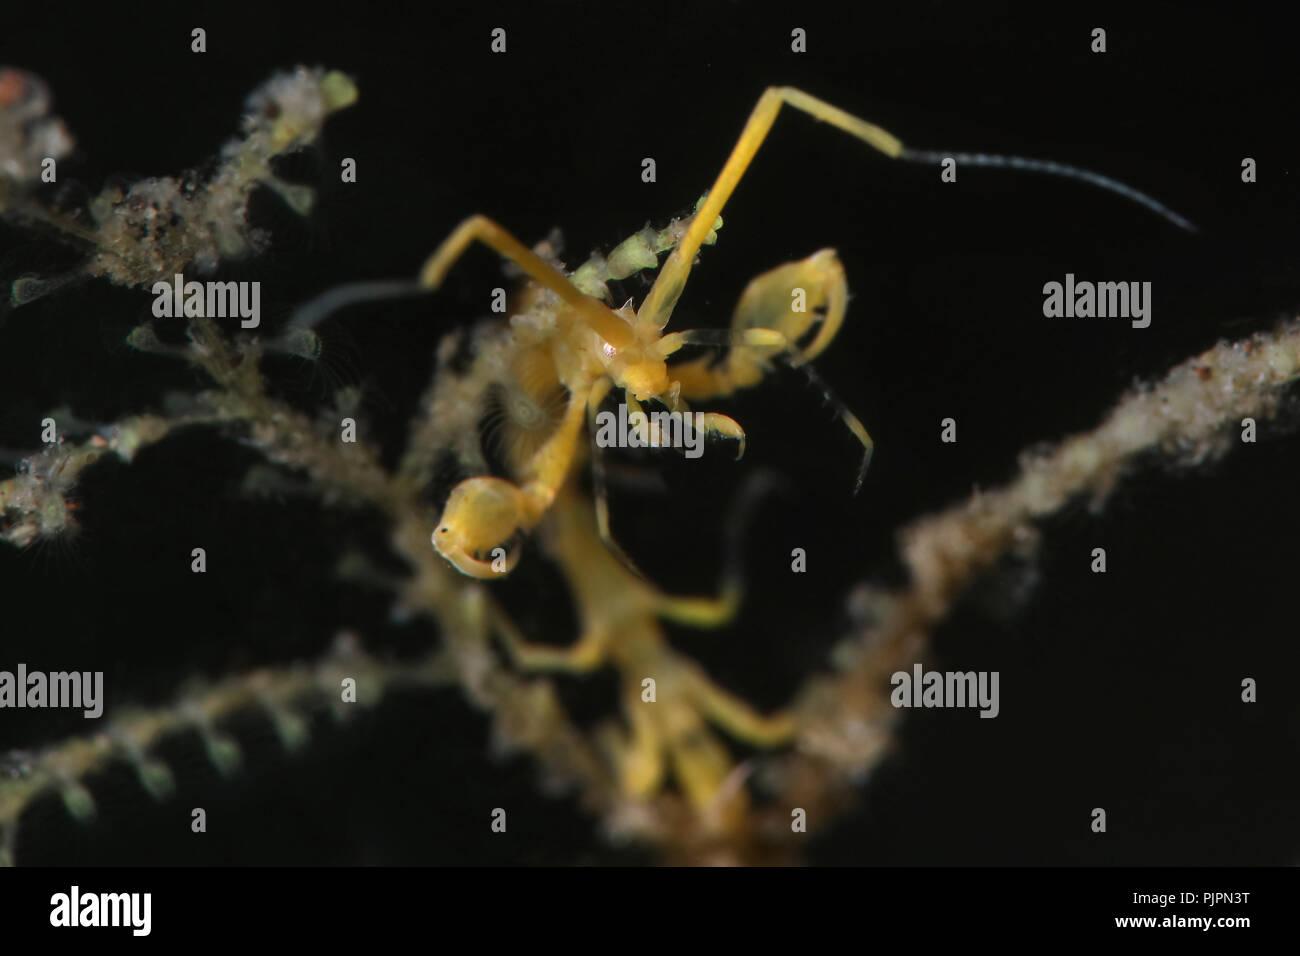 Skeleton Shrimp (Caprella sp.) Picture was taken in Lembeh strait, Indonesia - Stock Image